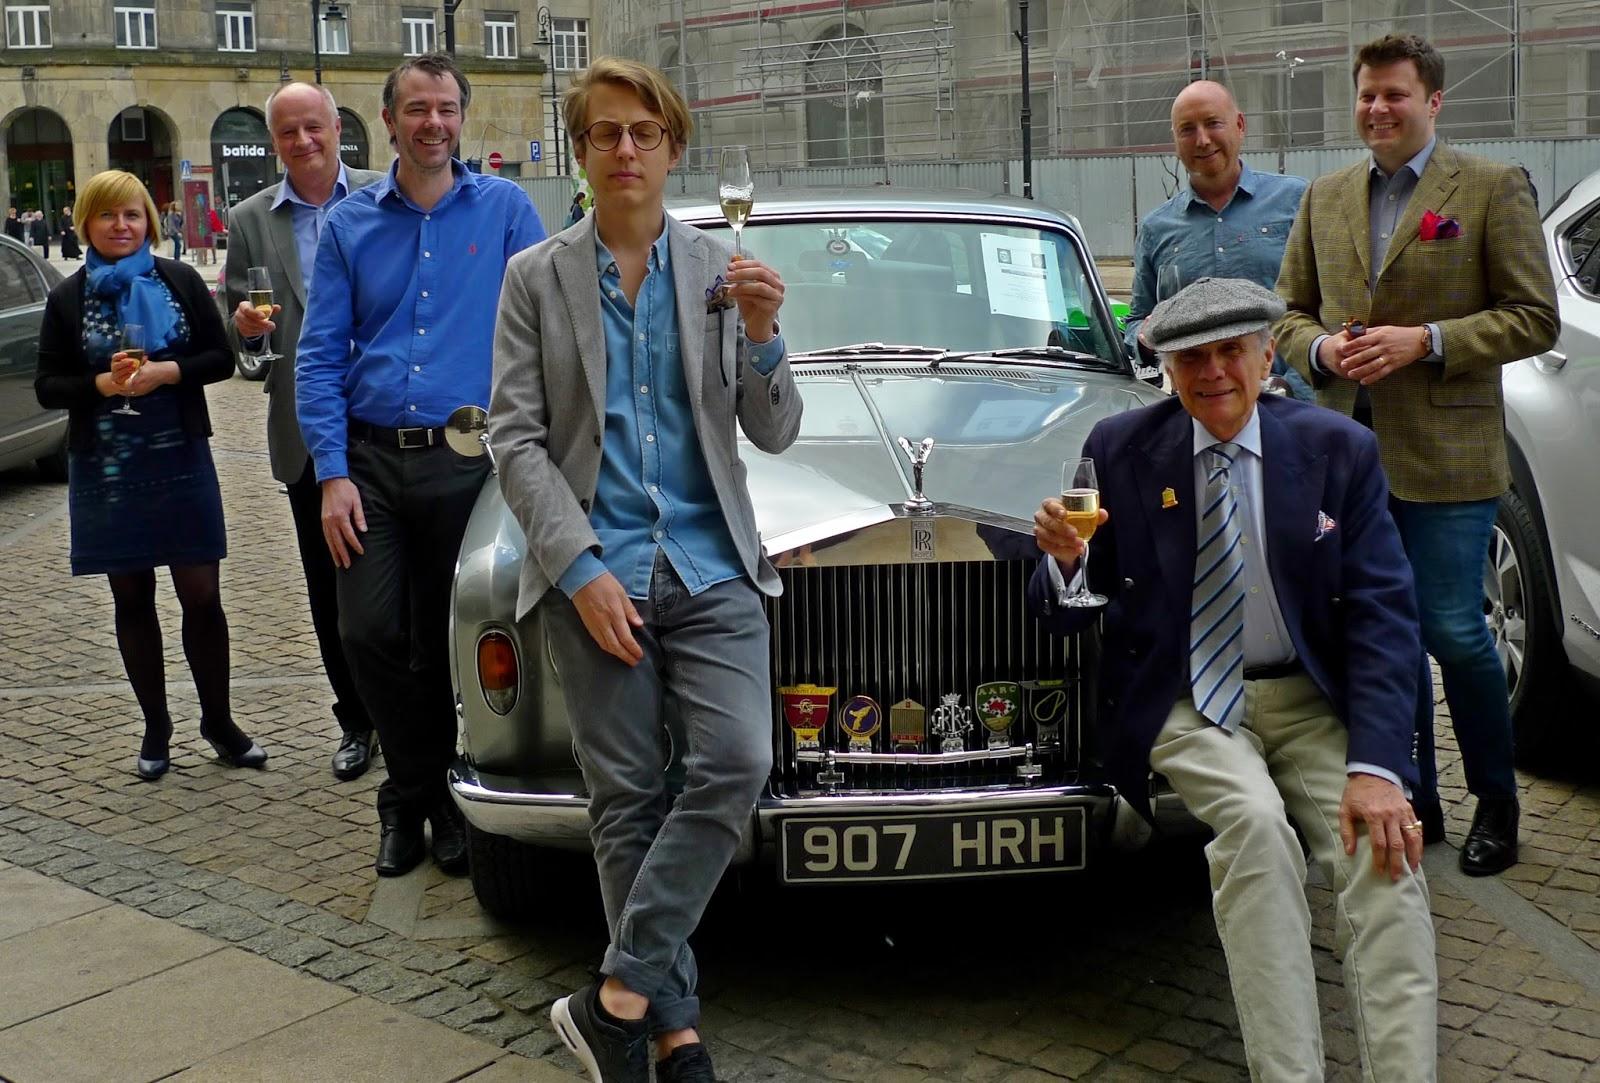 Casual Car Club Ccc Warsaw Poland The Honourable Charles